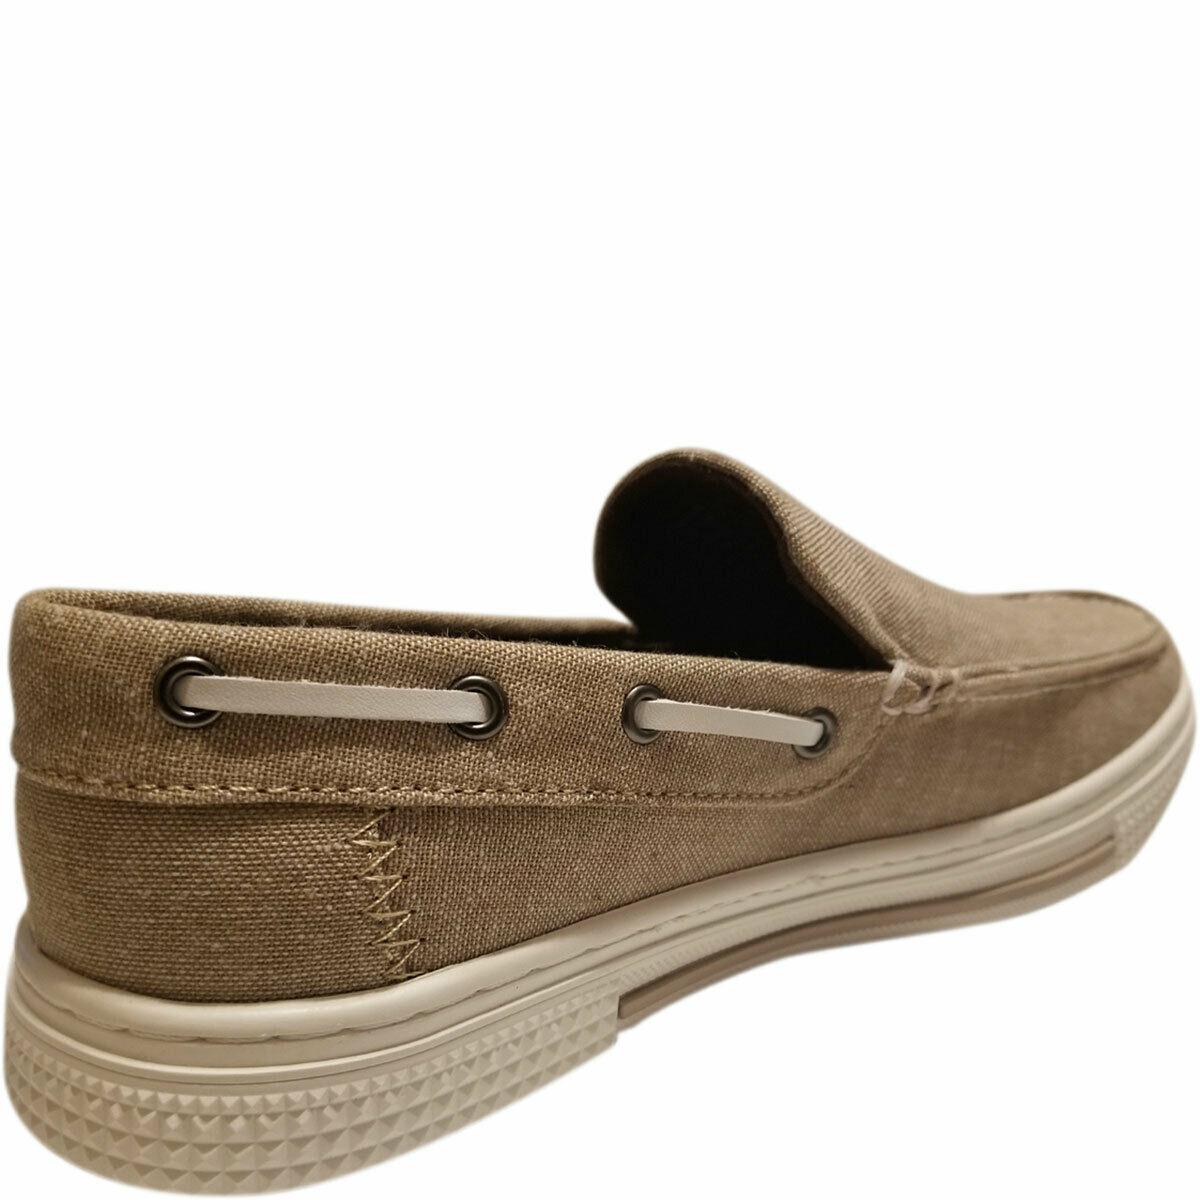 Kenneth Cole Reaction Men's Ankir Canvas Slip-on Boat Shoes Beige Sand 9.5 M ... image 5